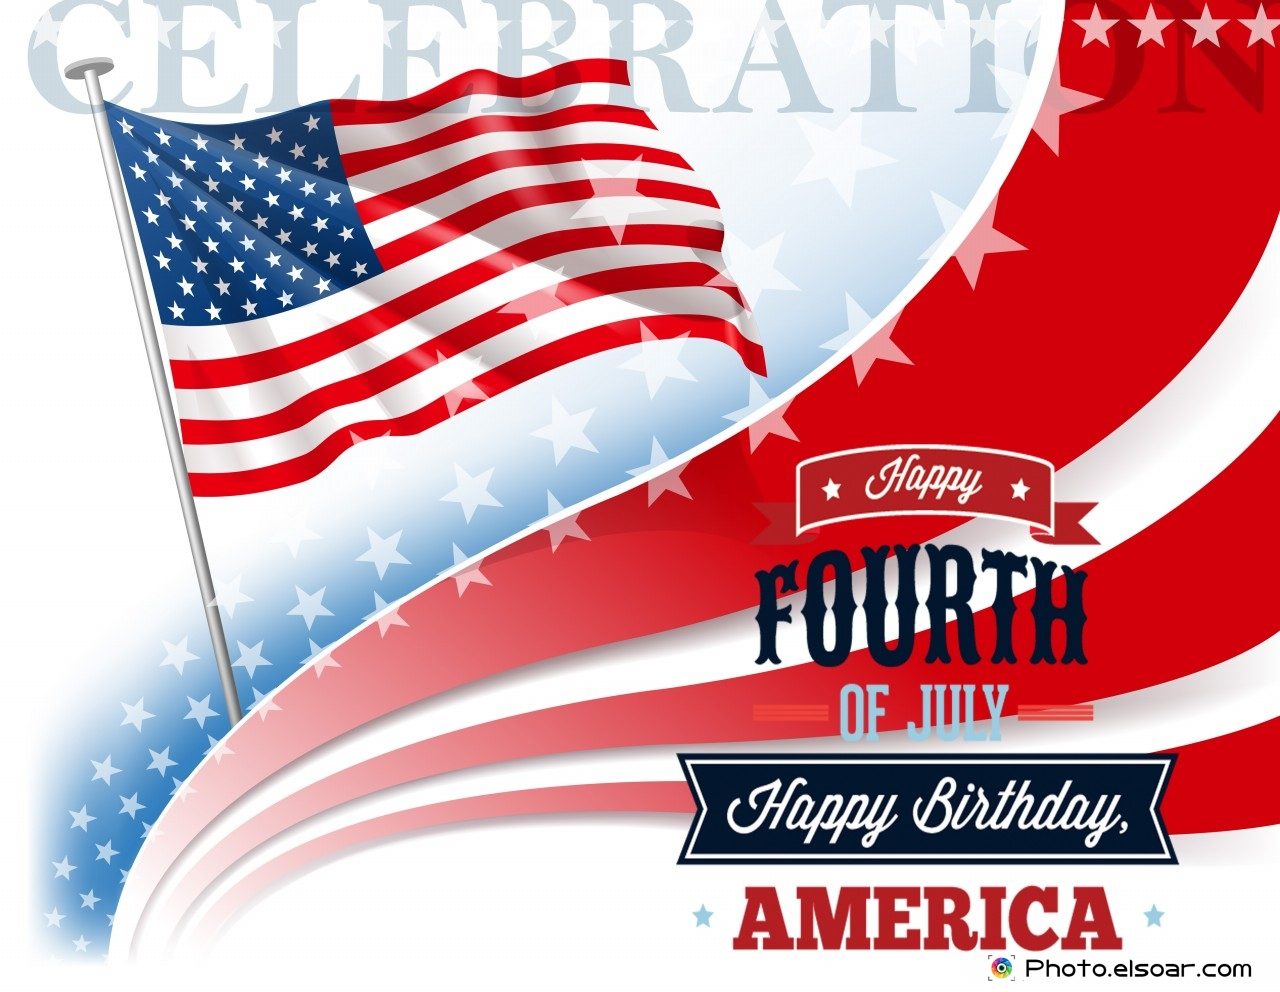 Happy Fourth Of July Birthday America